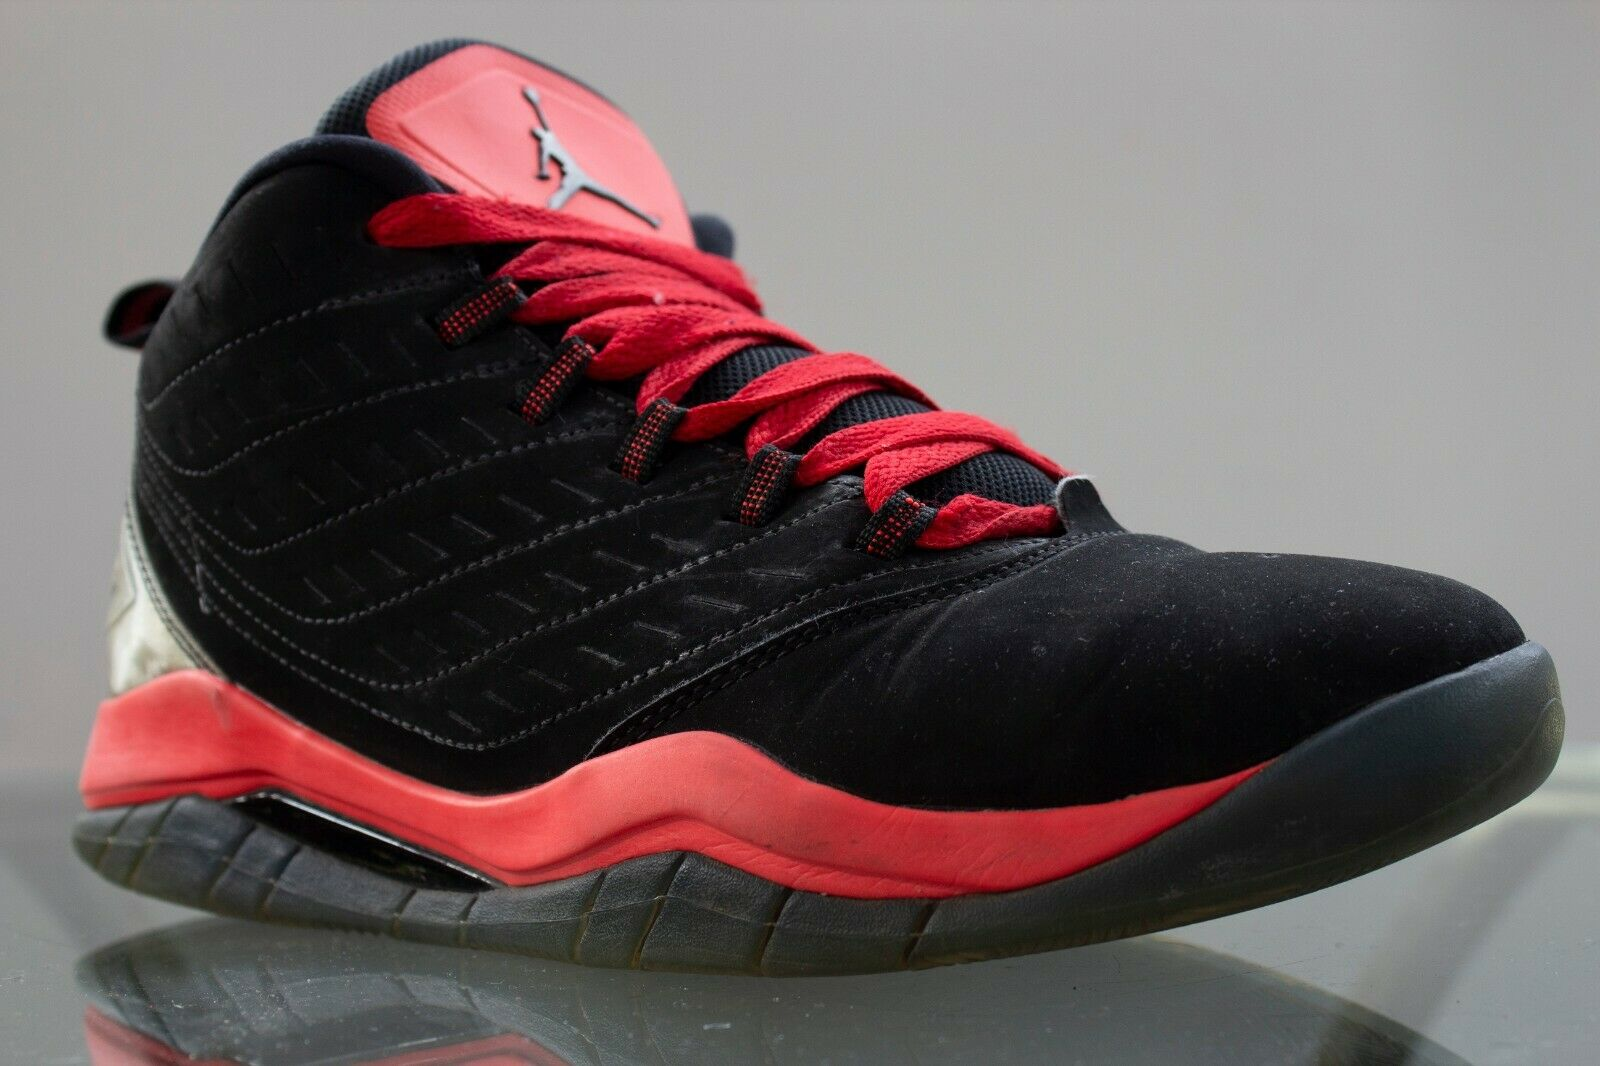 Nike Air Jordan Velocity Black   Infrared shoes Mens 688975 023 Sz 7.5